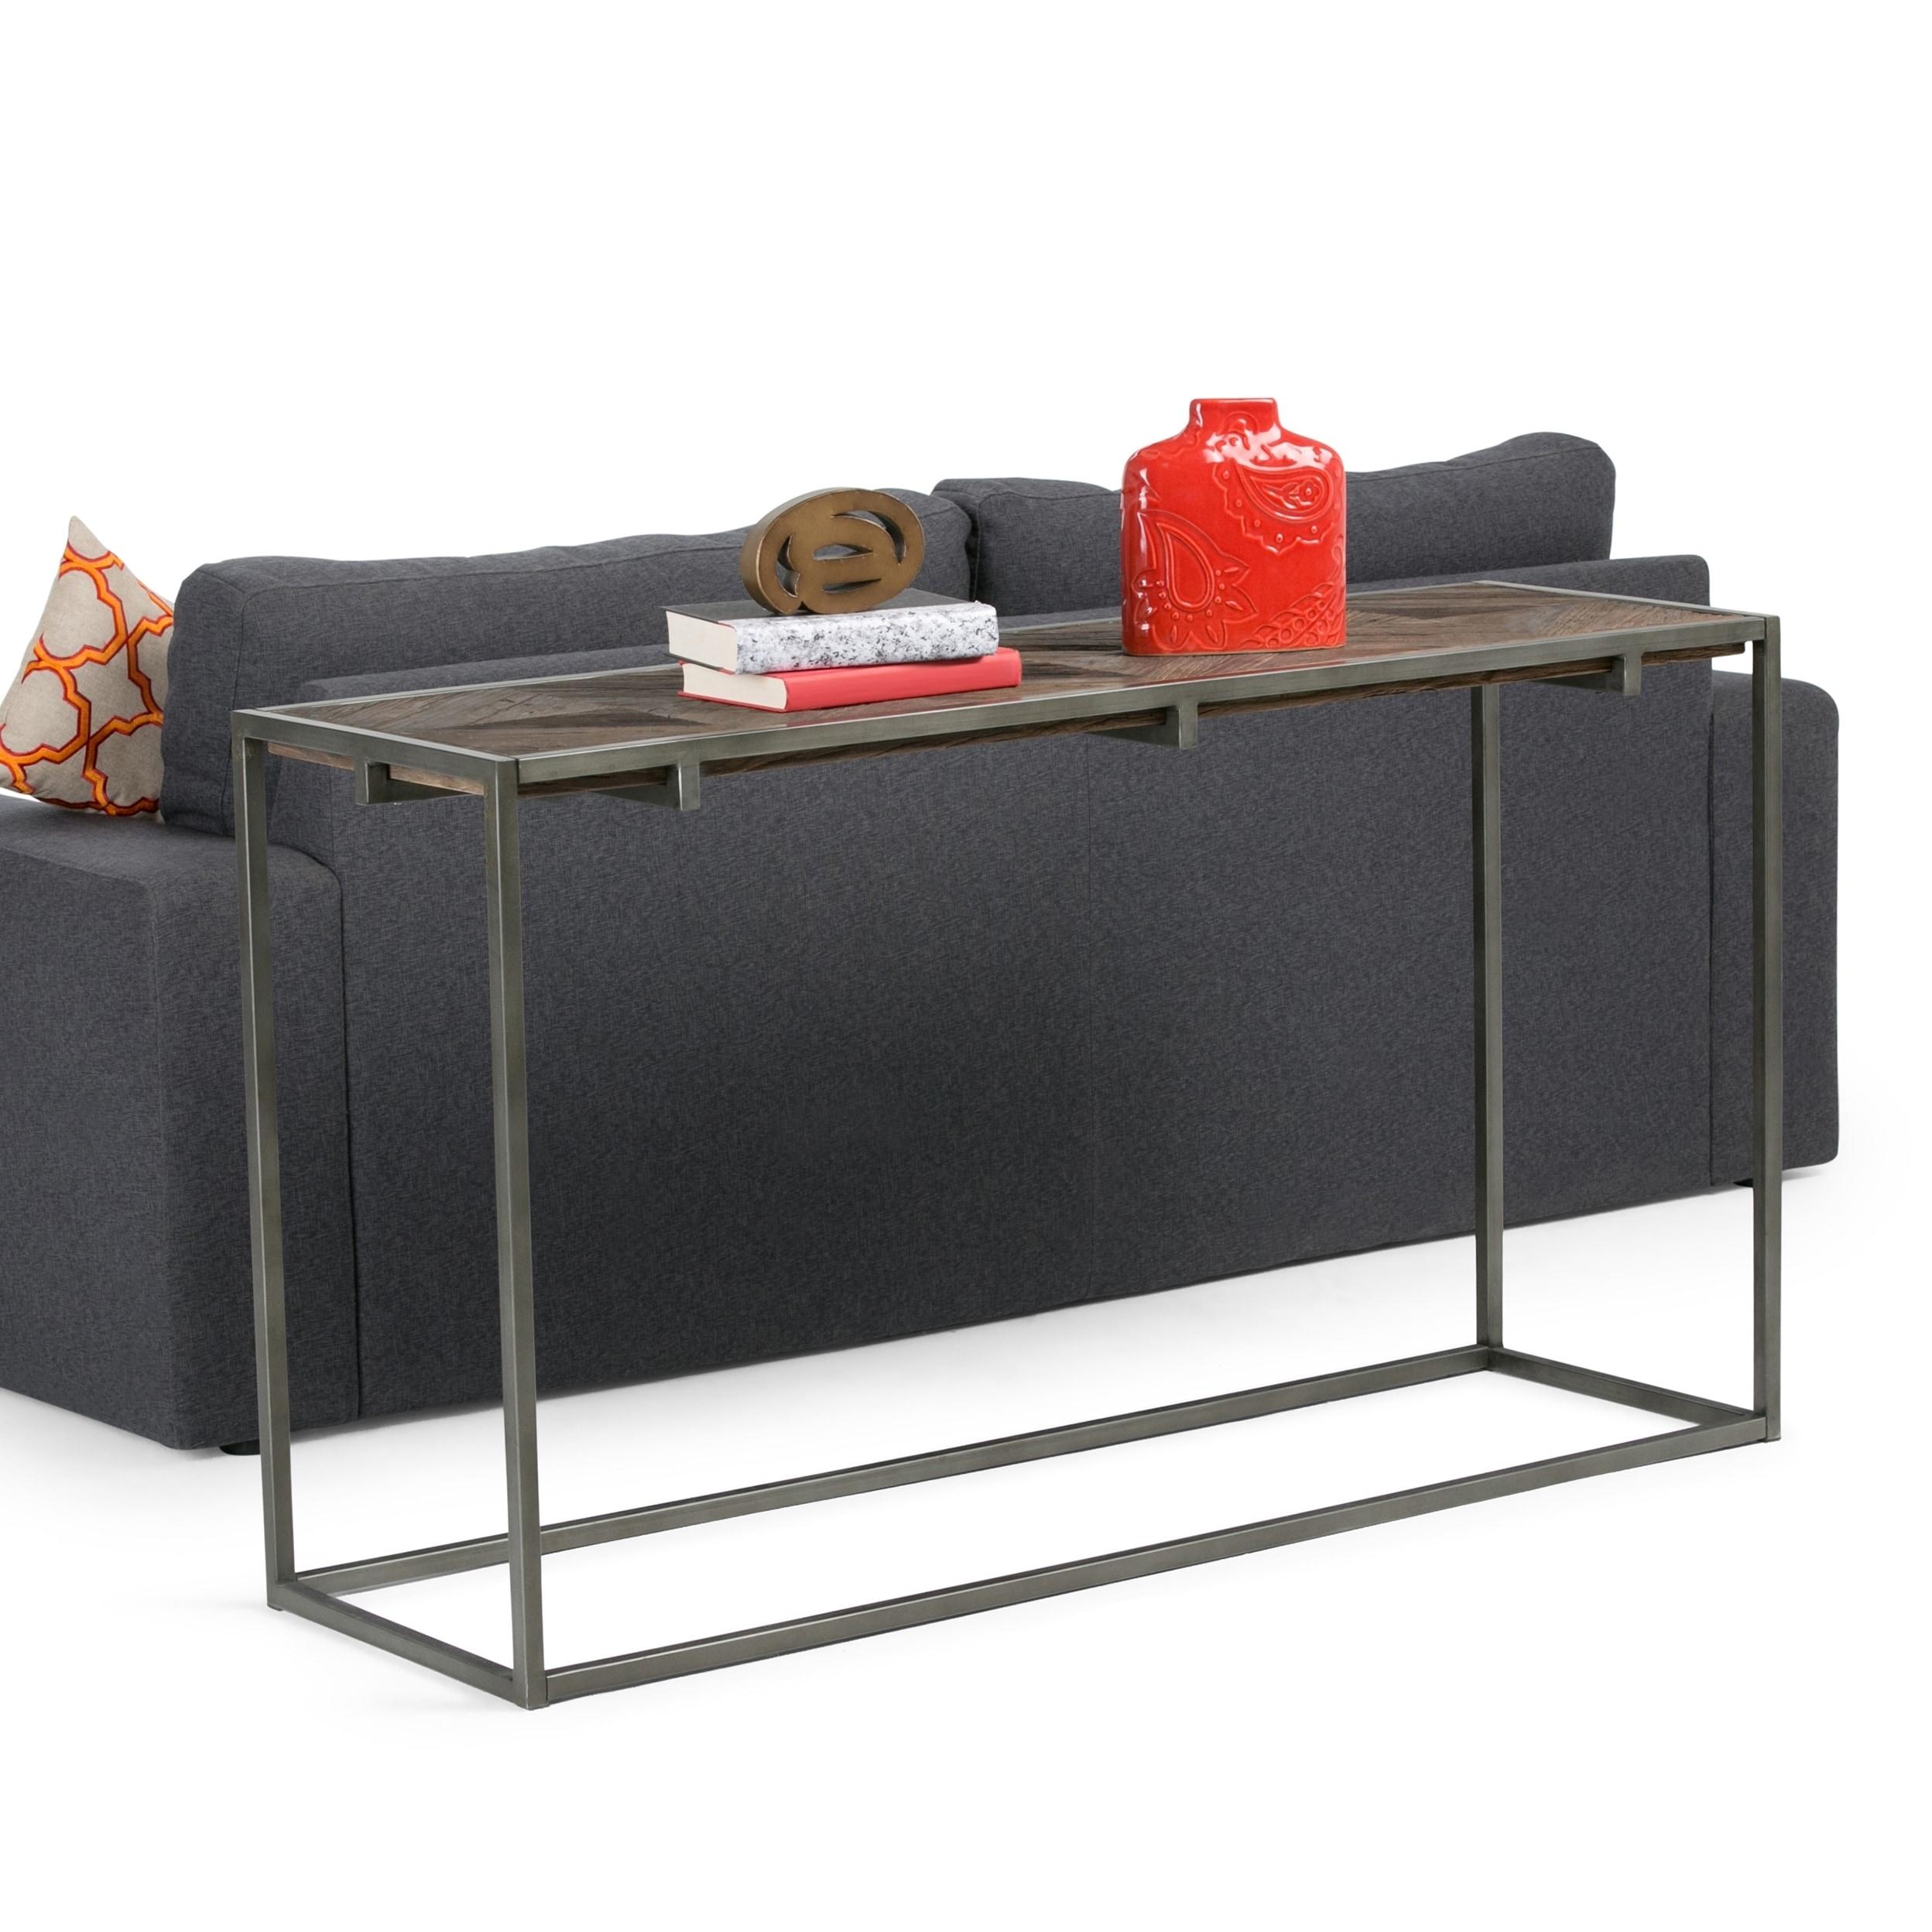 Wyndenhall Abigail Industrial Solid Distressed Elm Wood Metal Console Sofa Table 54 W X 16 D X 30 H